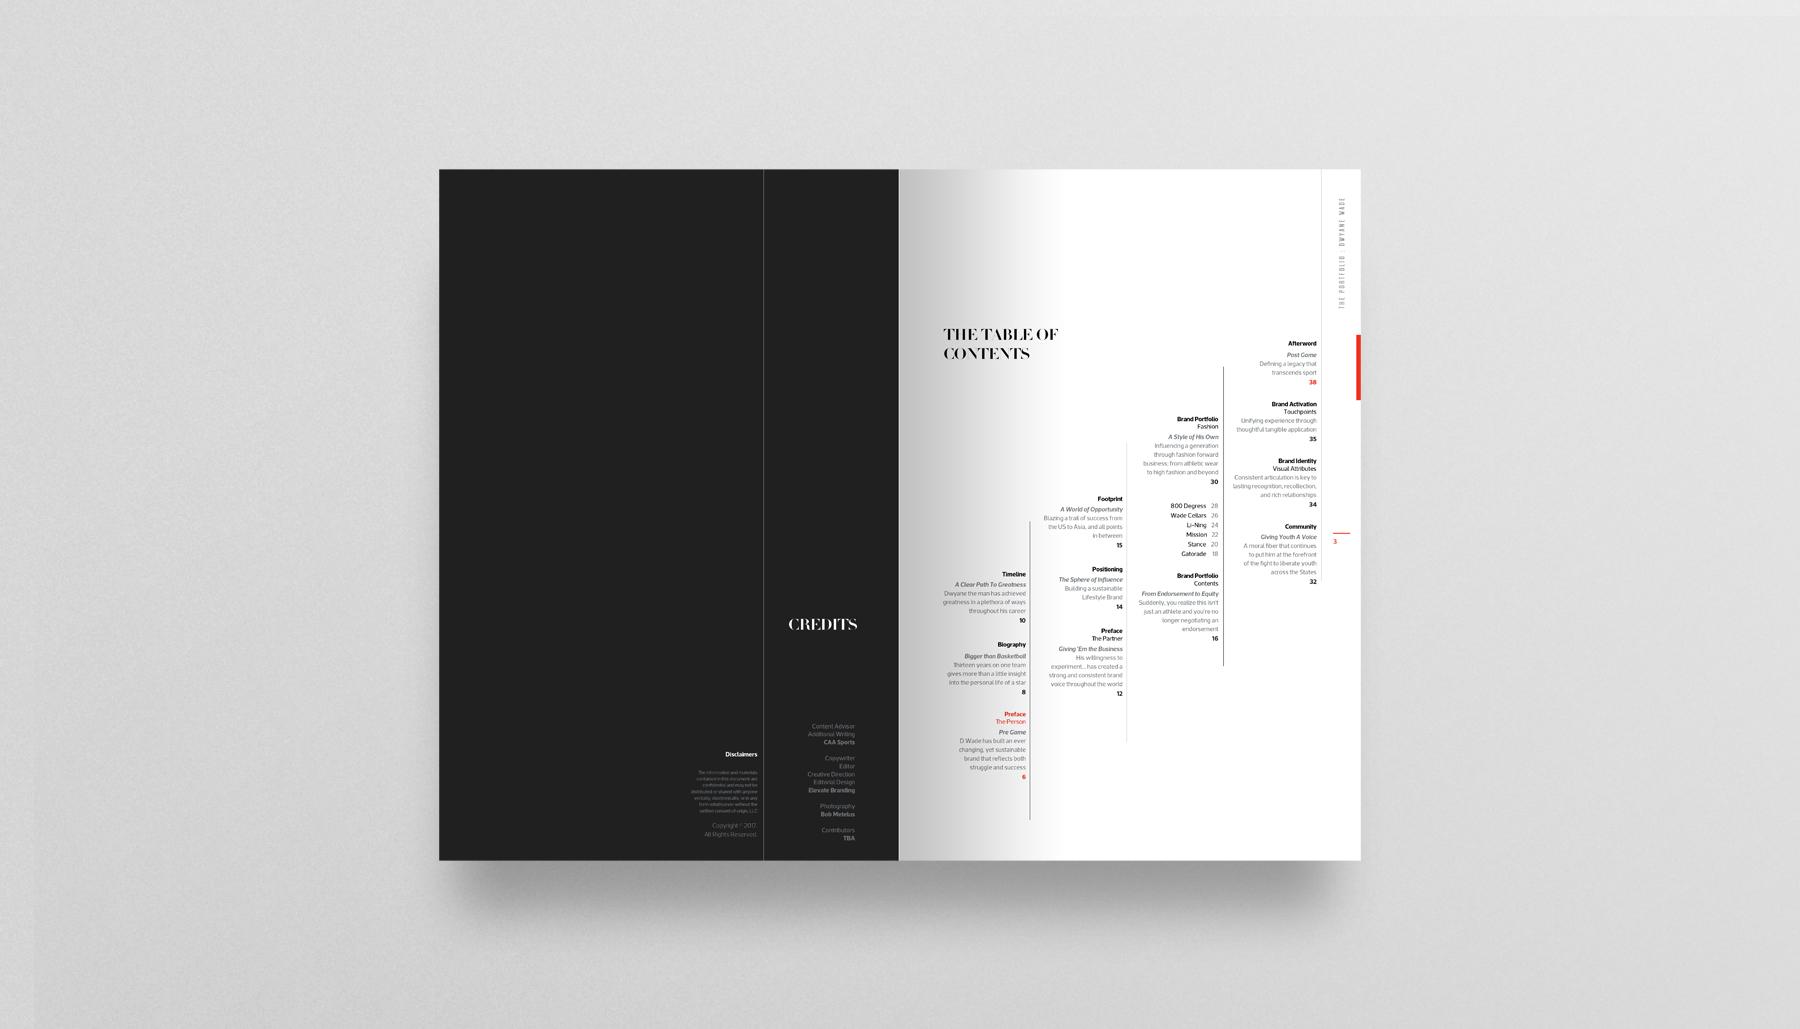 Dwyane Wade brand book by Elevate Branding, Inc.